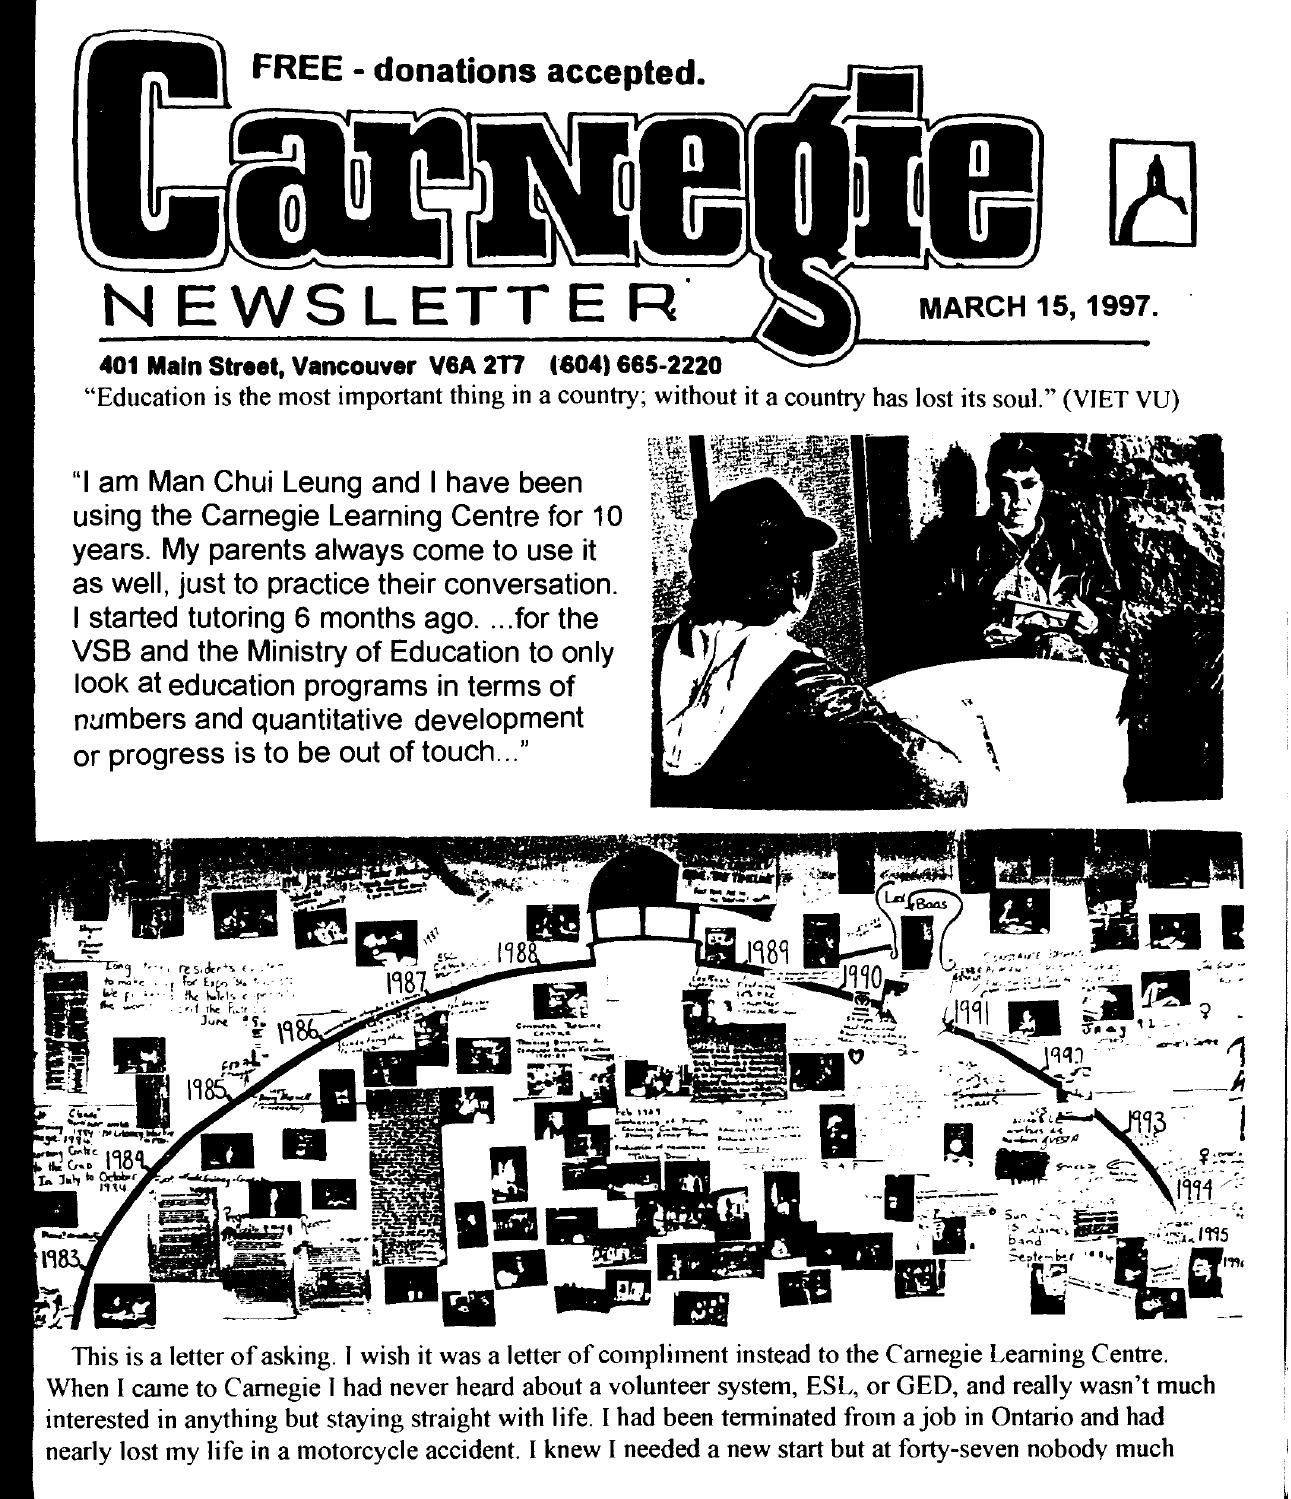 March 15, 1997, carnegie newsletter by Carnegie Newsletter - issuu